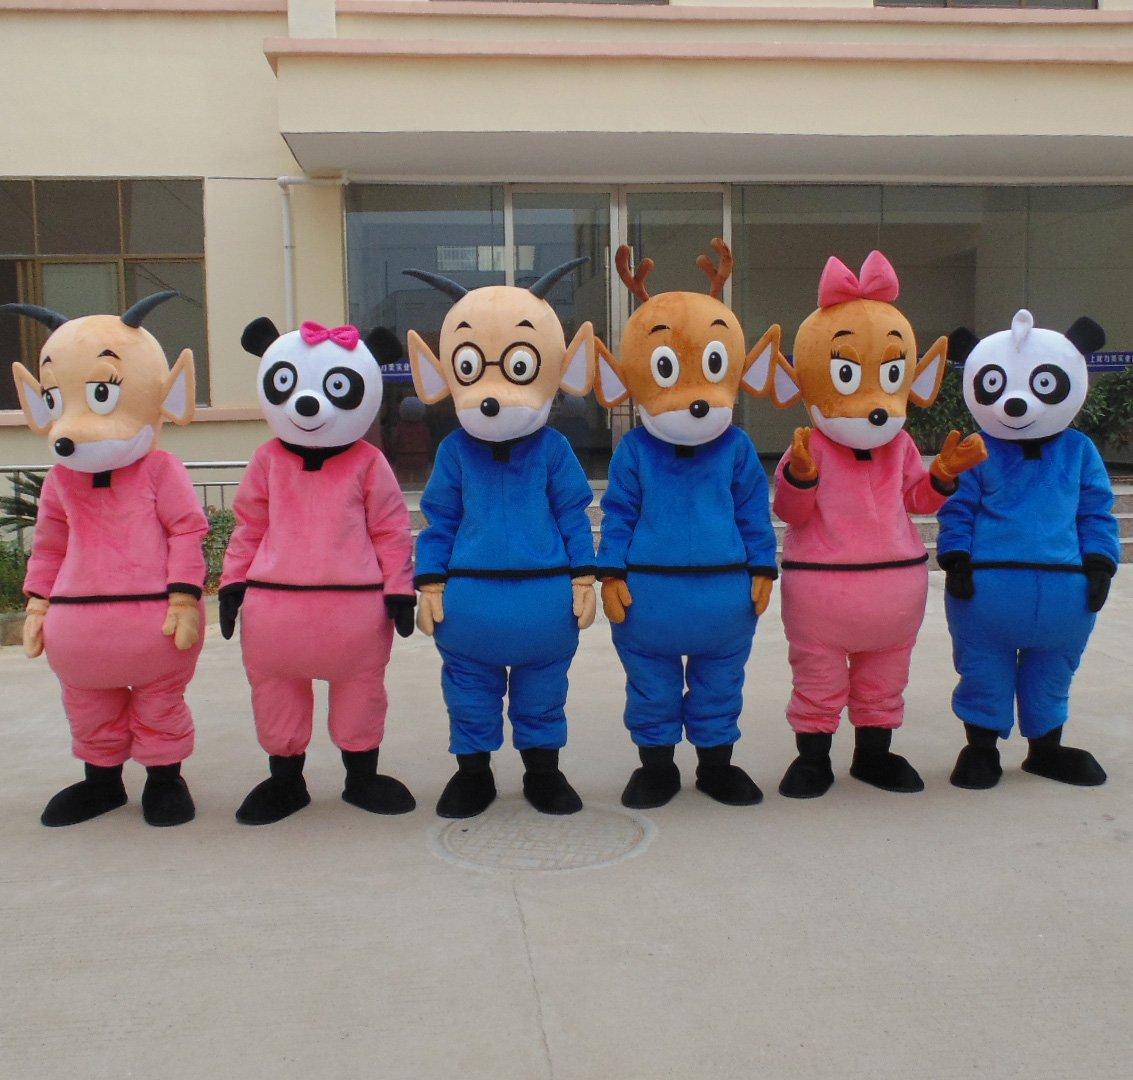 Cartoon Doll Doll Clothing Cartoon Animation Cartoon Dolls Clothing Walking Advertisements Mascot Costume